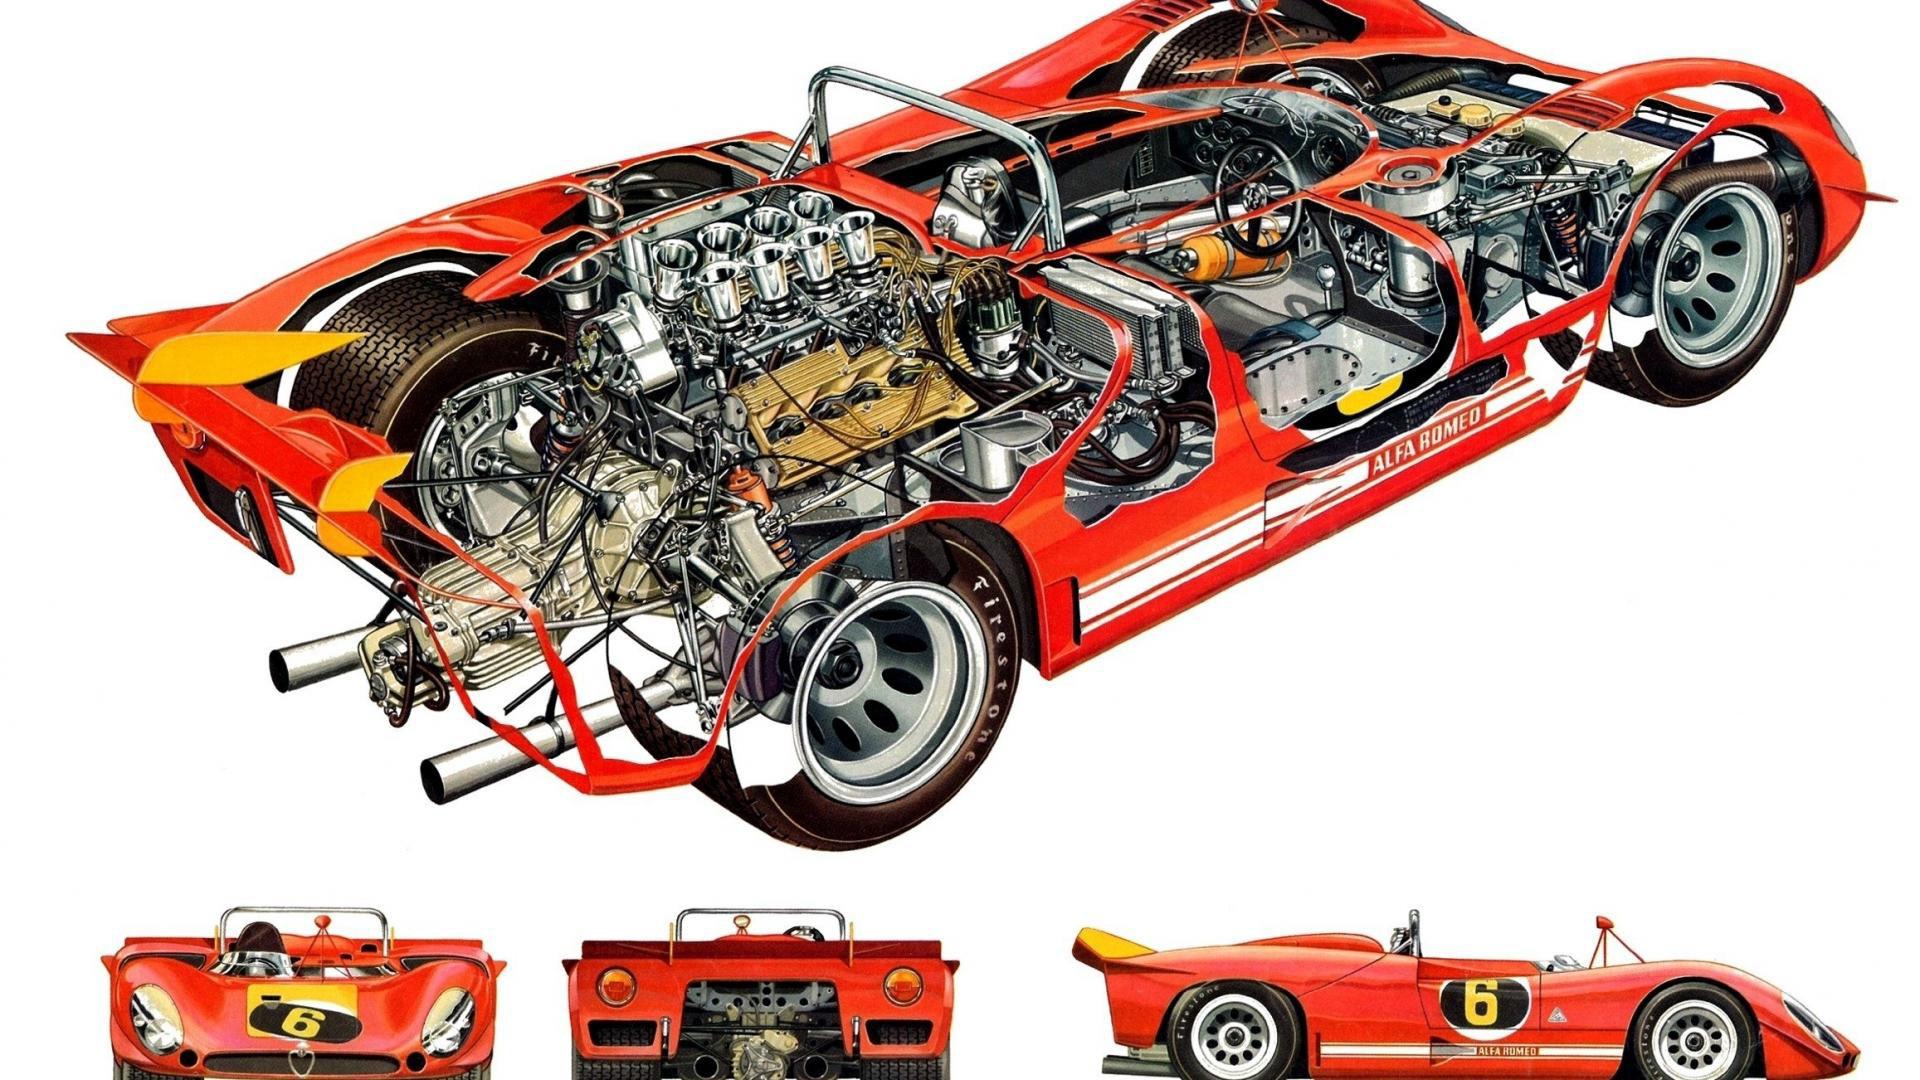 Alfa Romeo Tipo 33 cutaway